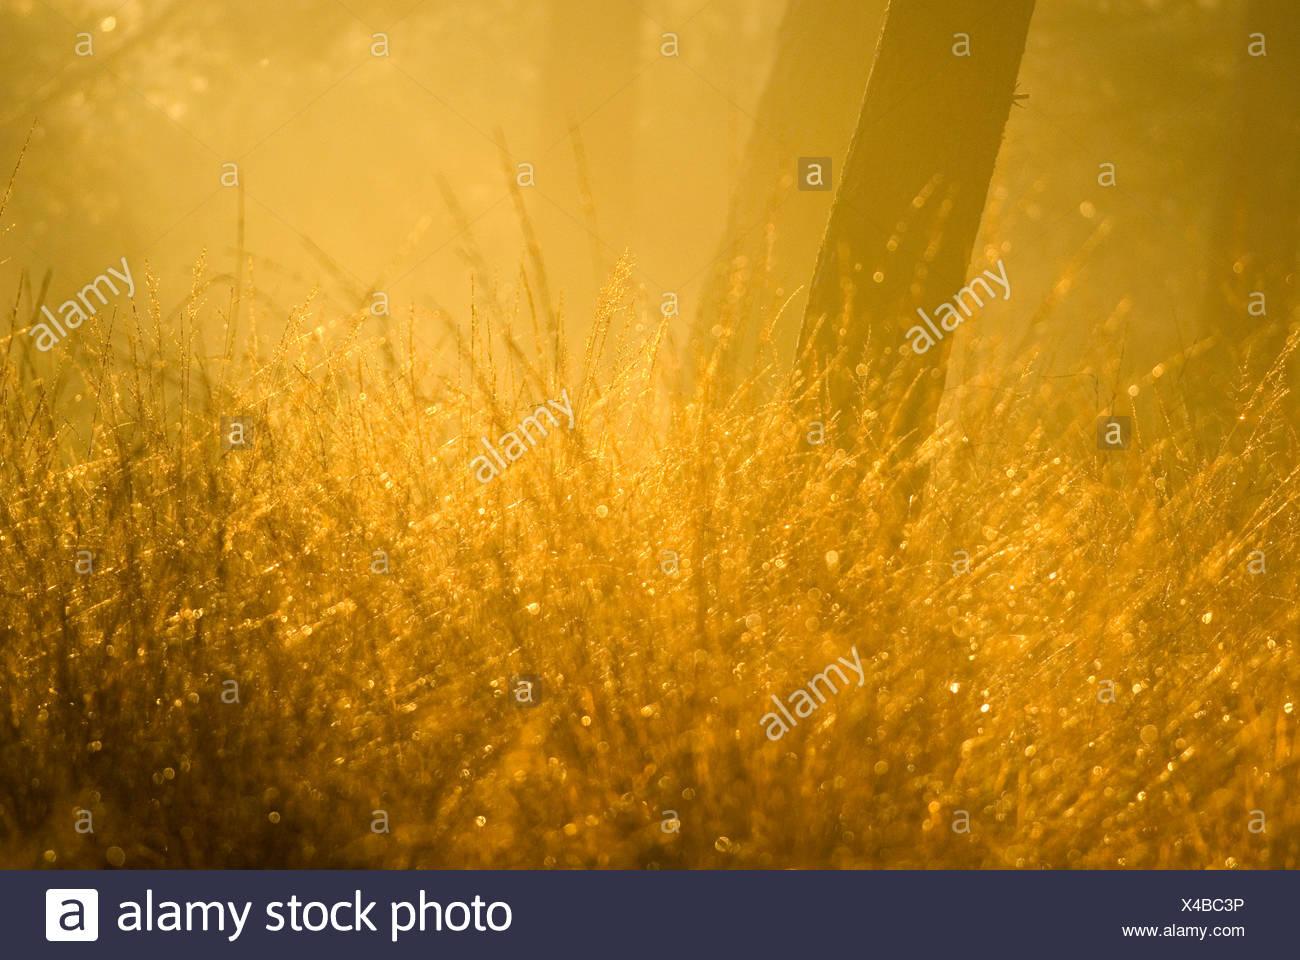 bochtige smele in naaldbos met gouden ochtendlicht; wavy hair-grass growing in pine forest bathed in golden licht - Stock Image